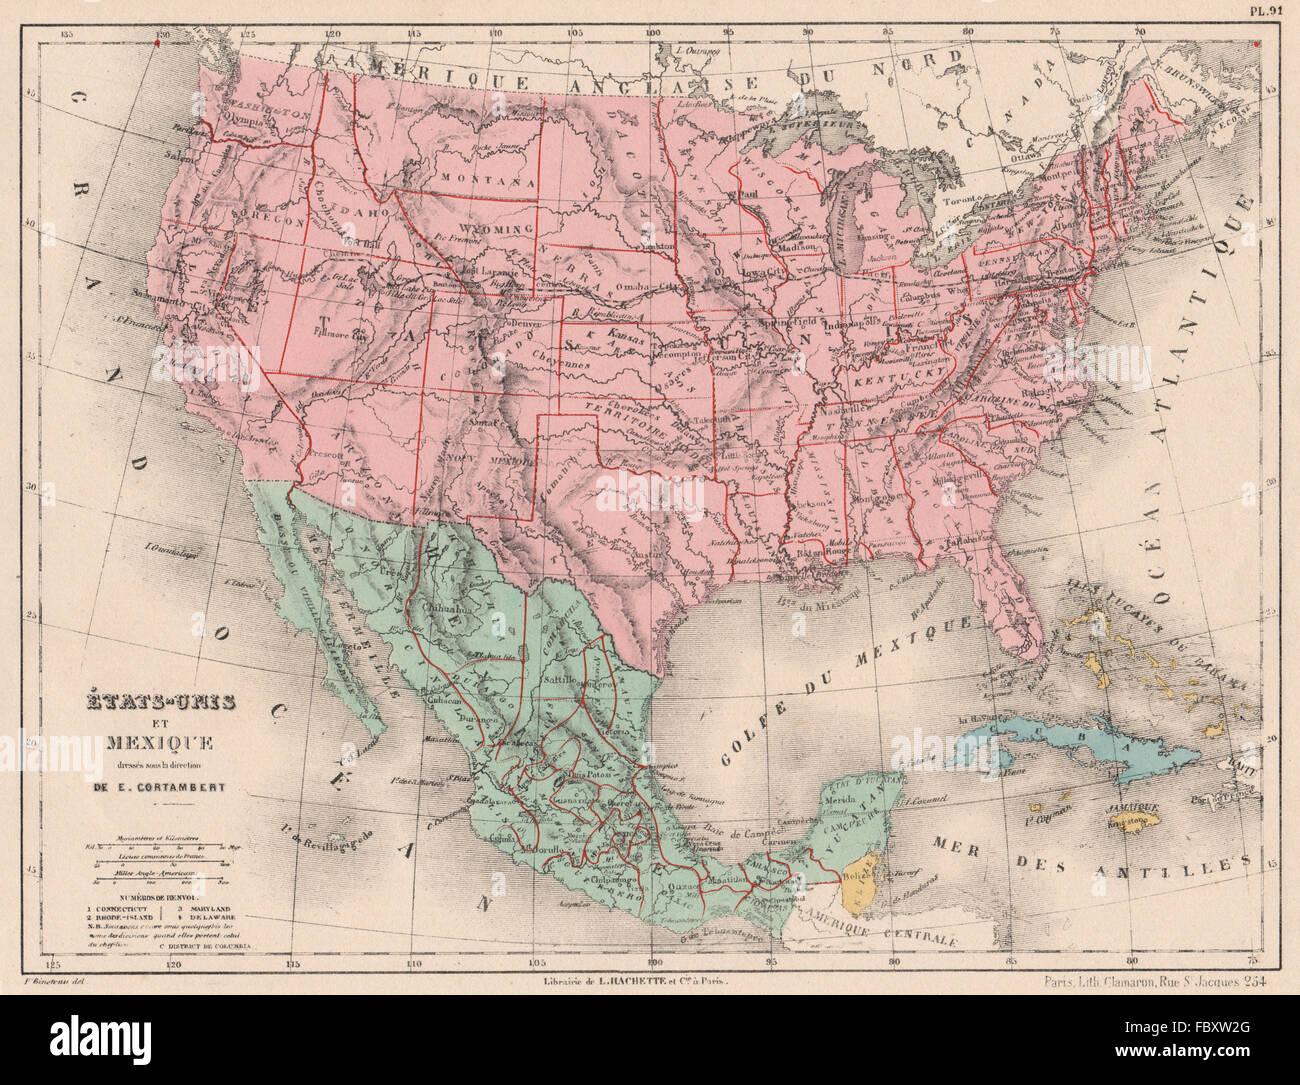 united states map 1880 United States And Mexico Bahamas Cuba North America Cortambert